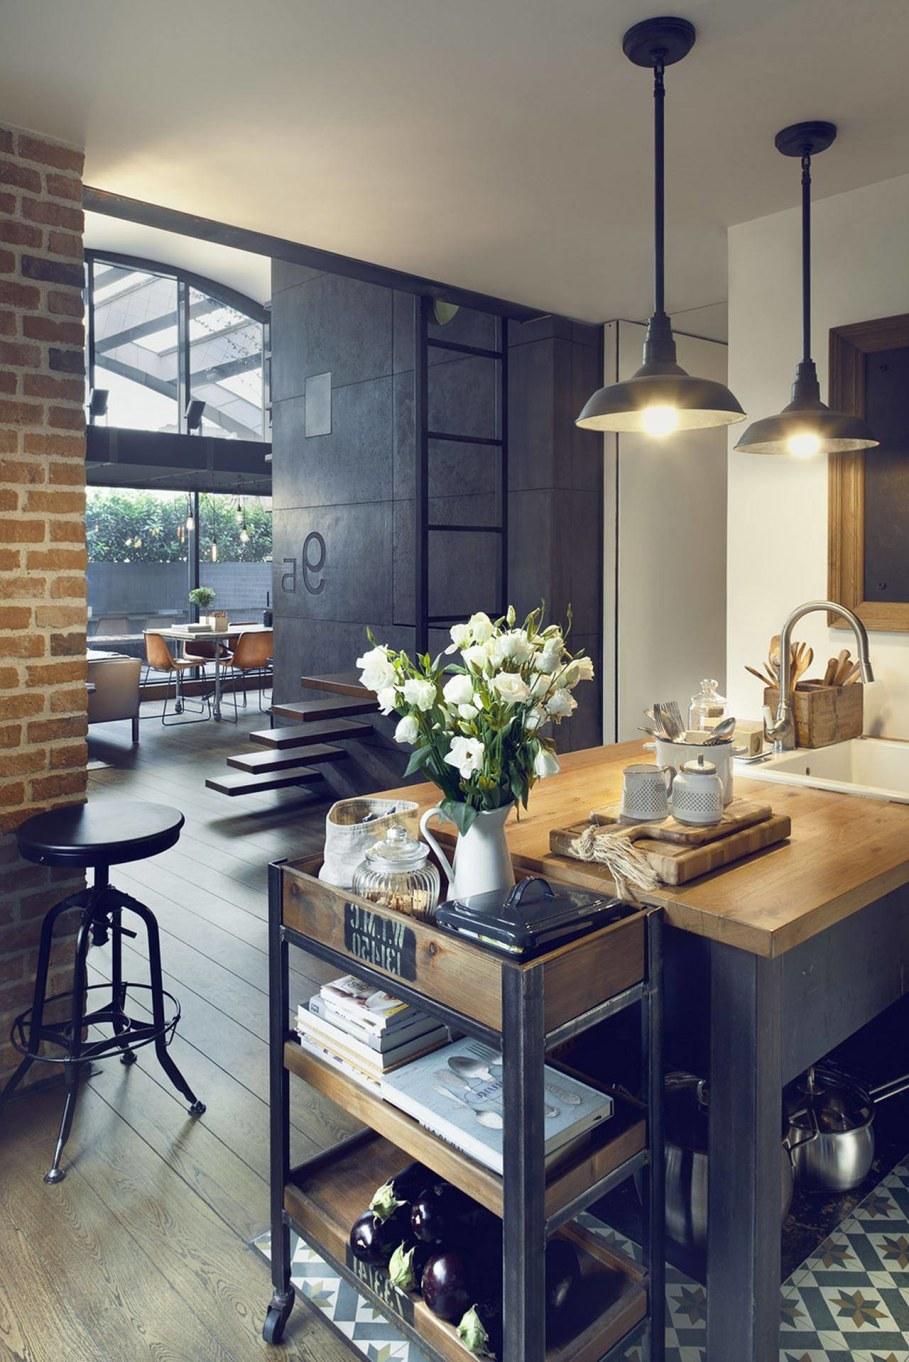 Attic Apartment By Dimitar Karanikolov